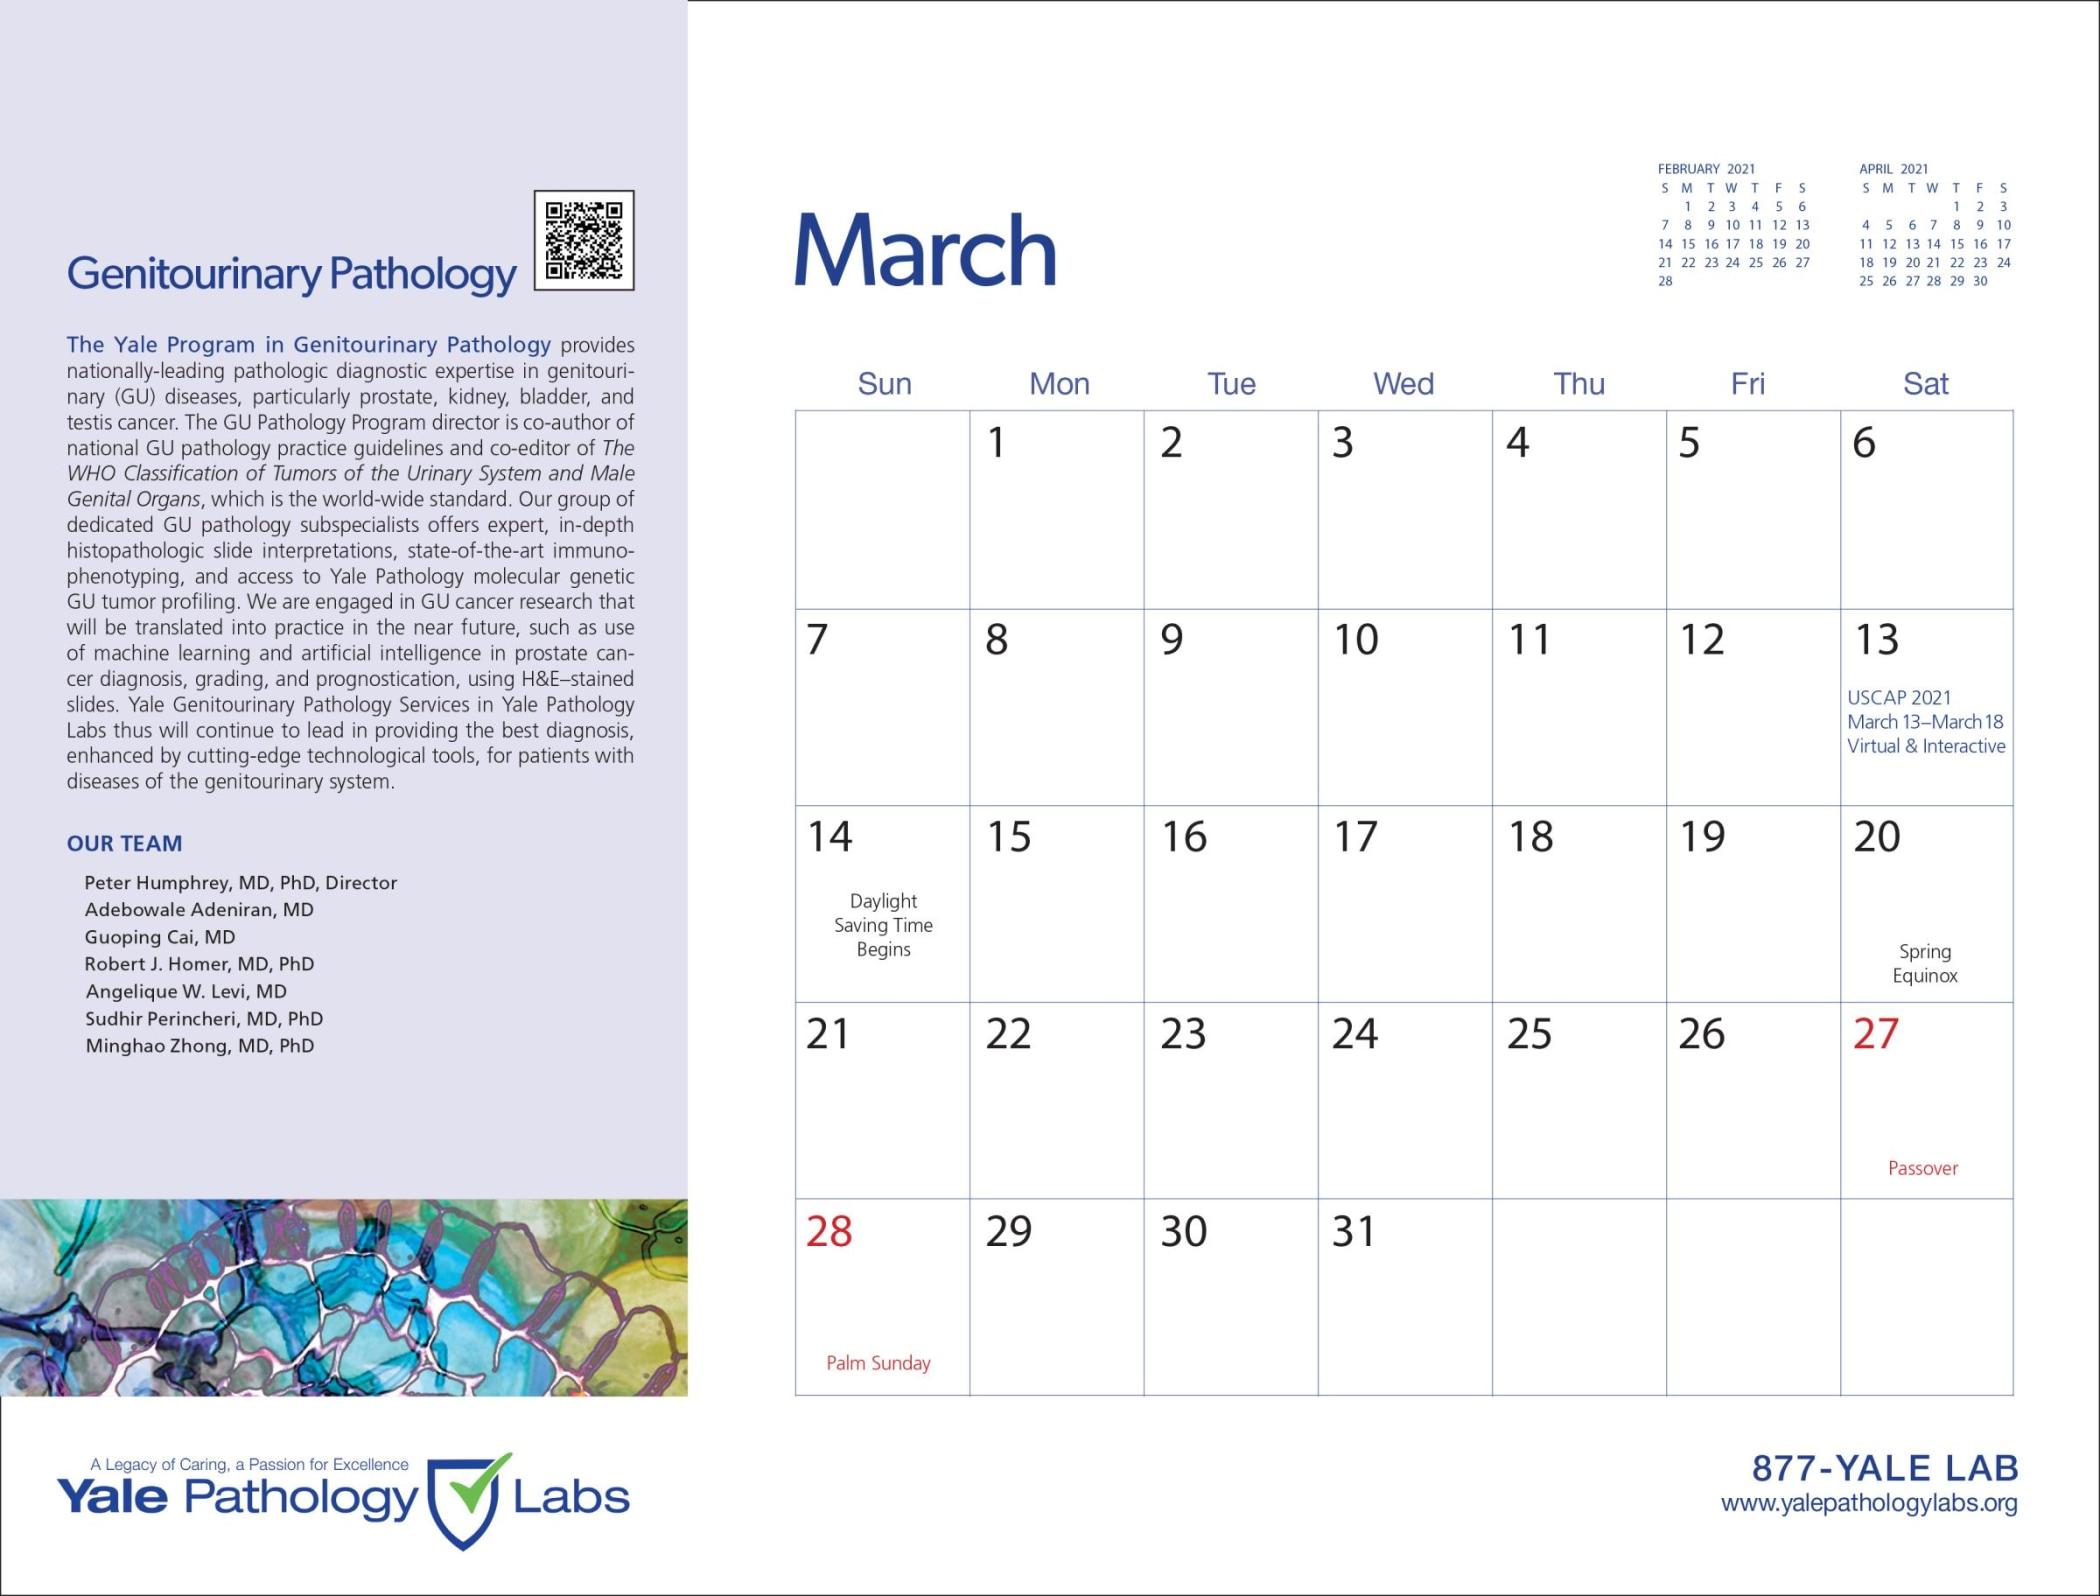 Yale Pathology Labs Calendar 2021 - March - GU